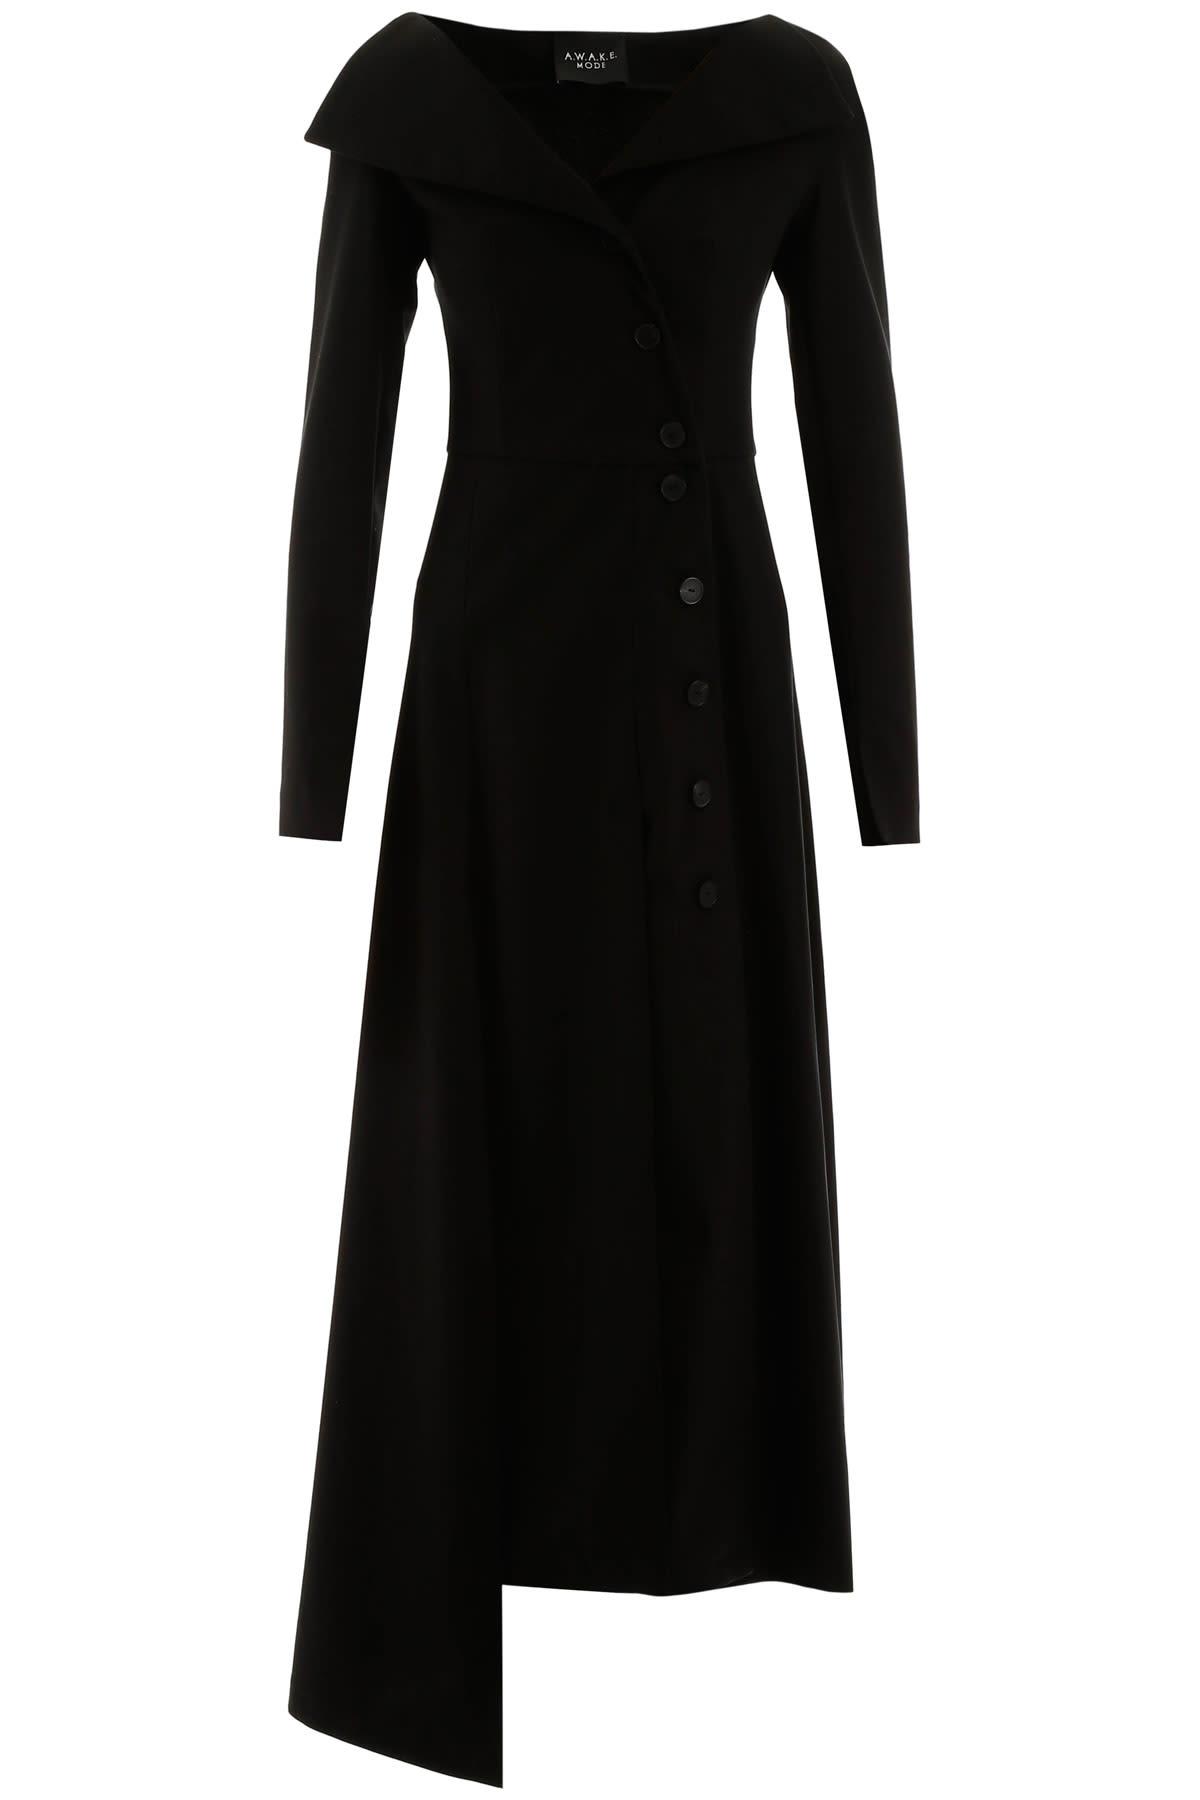 Buy A.W.A.K.E. Mode Buttoned Dress online, shop A.W.A.K.E. Mode with free shipping